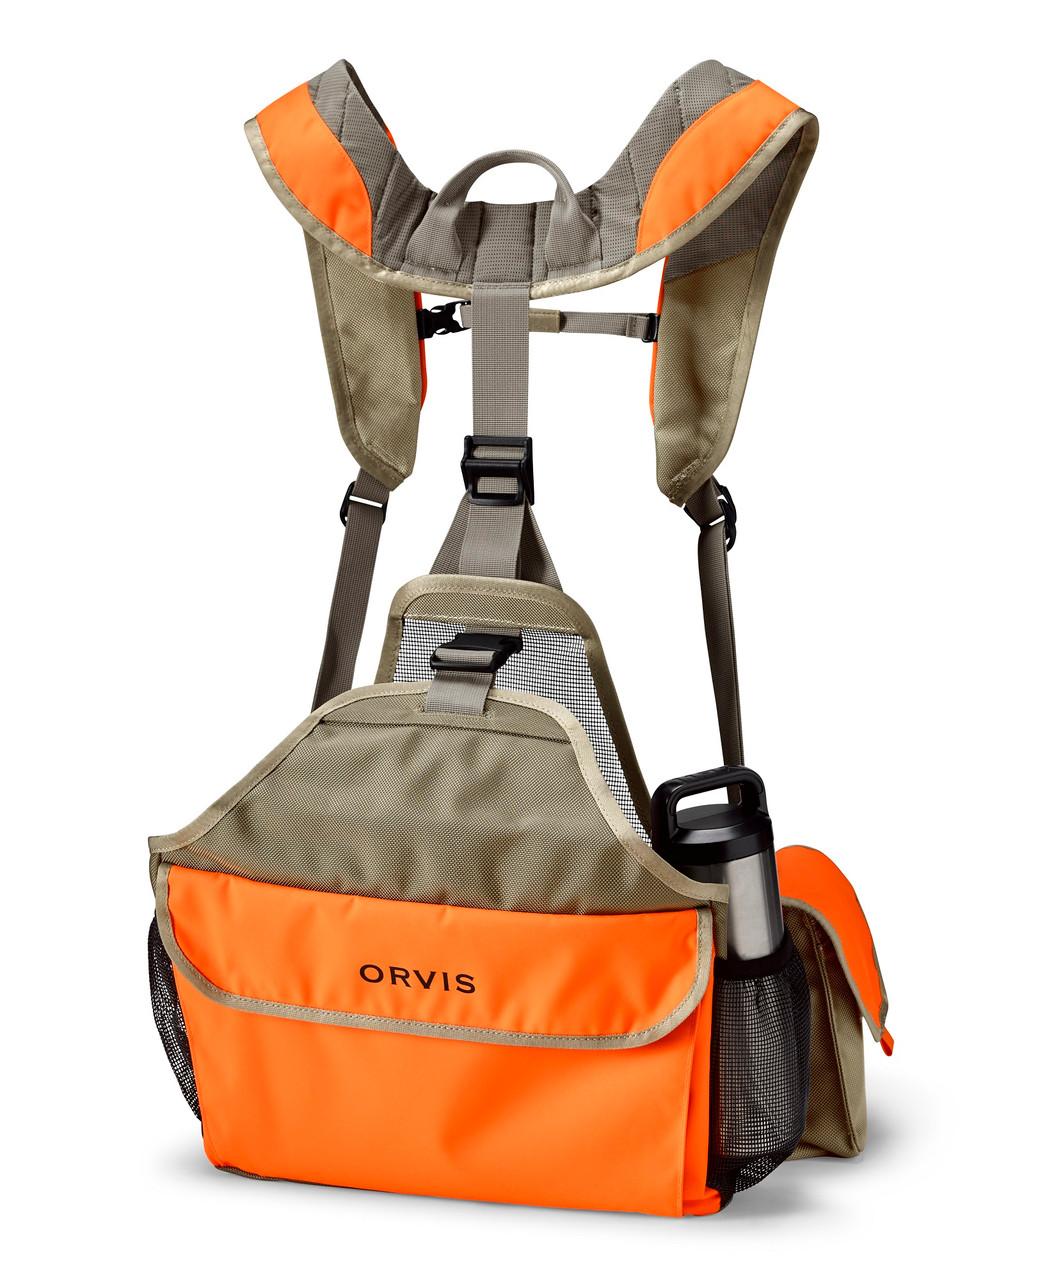 Orvis Pro LT Series Hunting Vest 2XJY